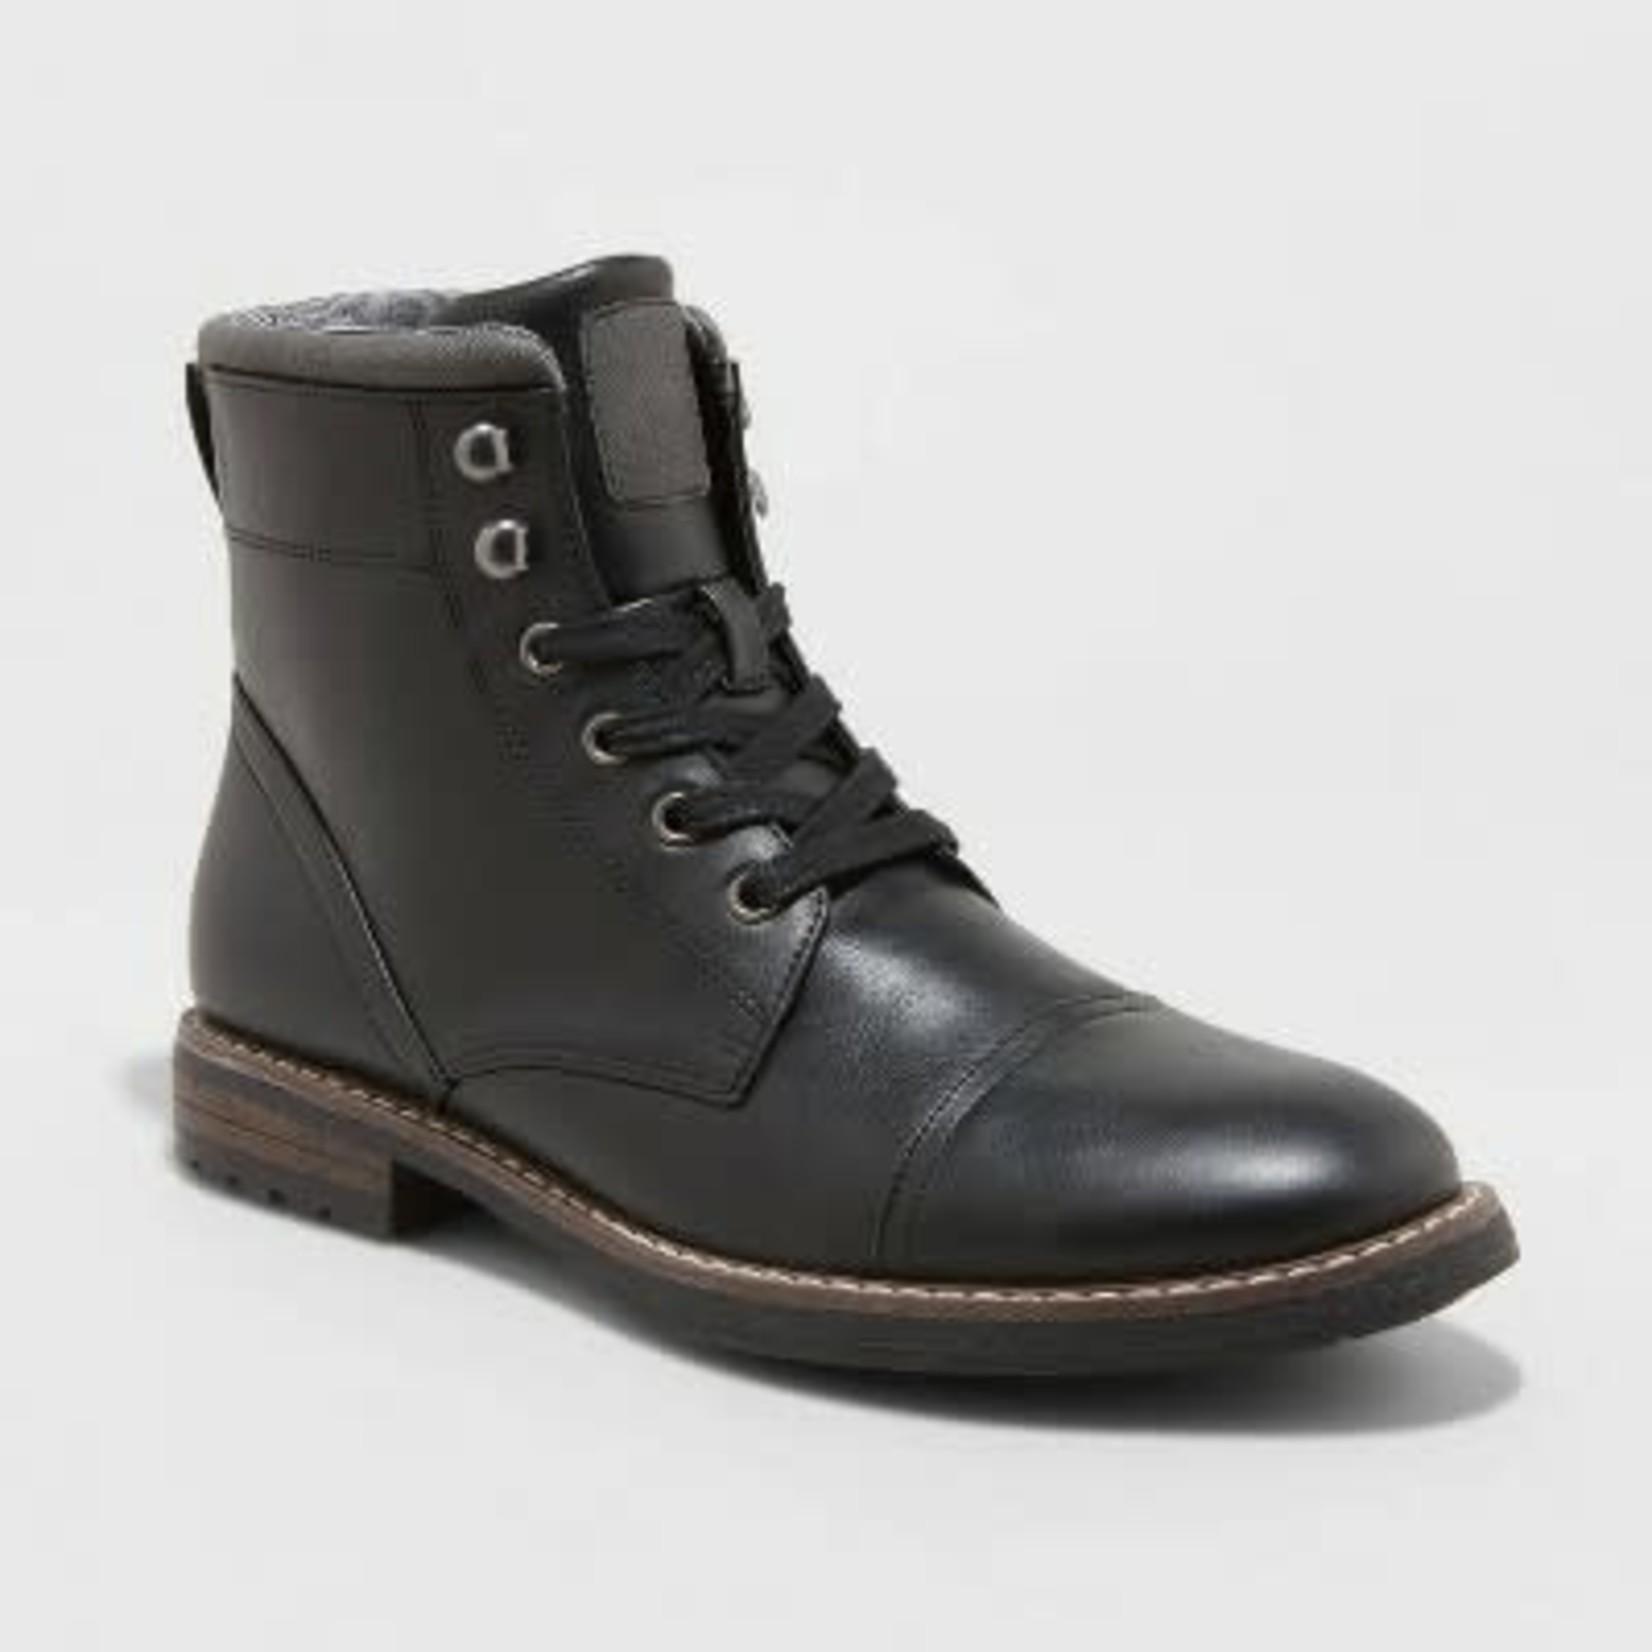 Men's Jeffrey Cap Toe Combat Boots - Goodfellow & Co- black - 9.5